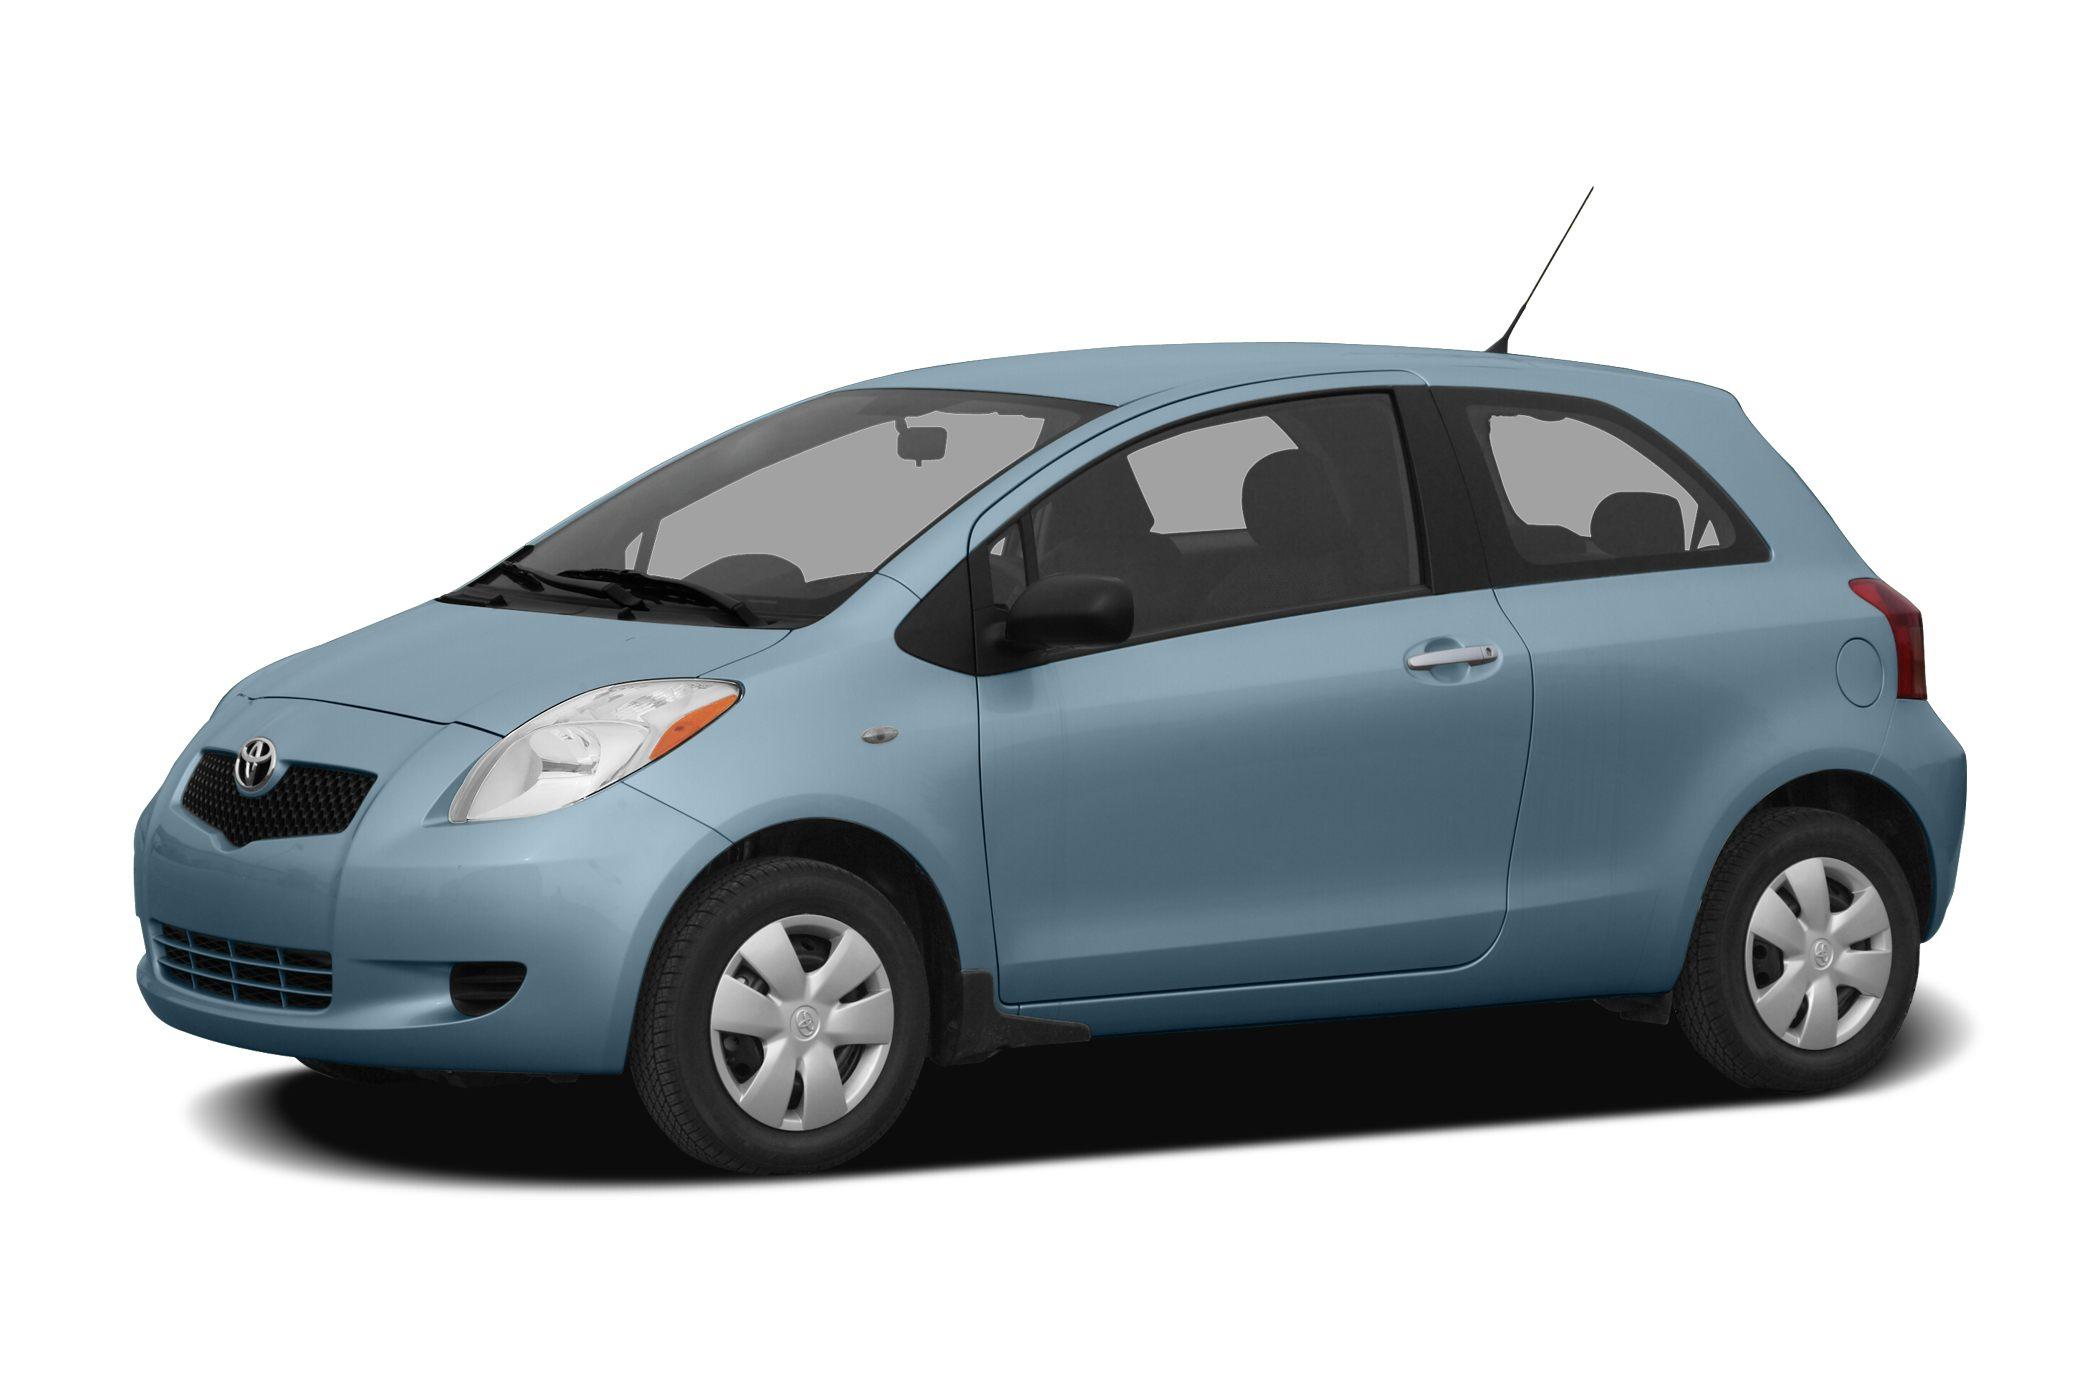 2009 toyota yaris hatchback reviews